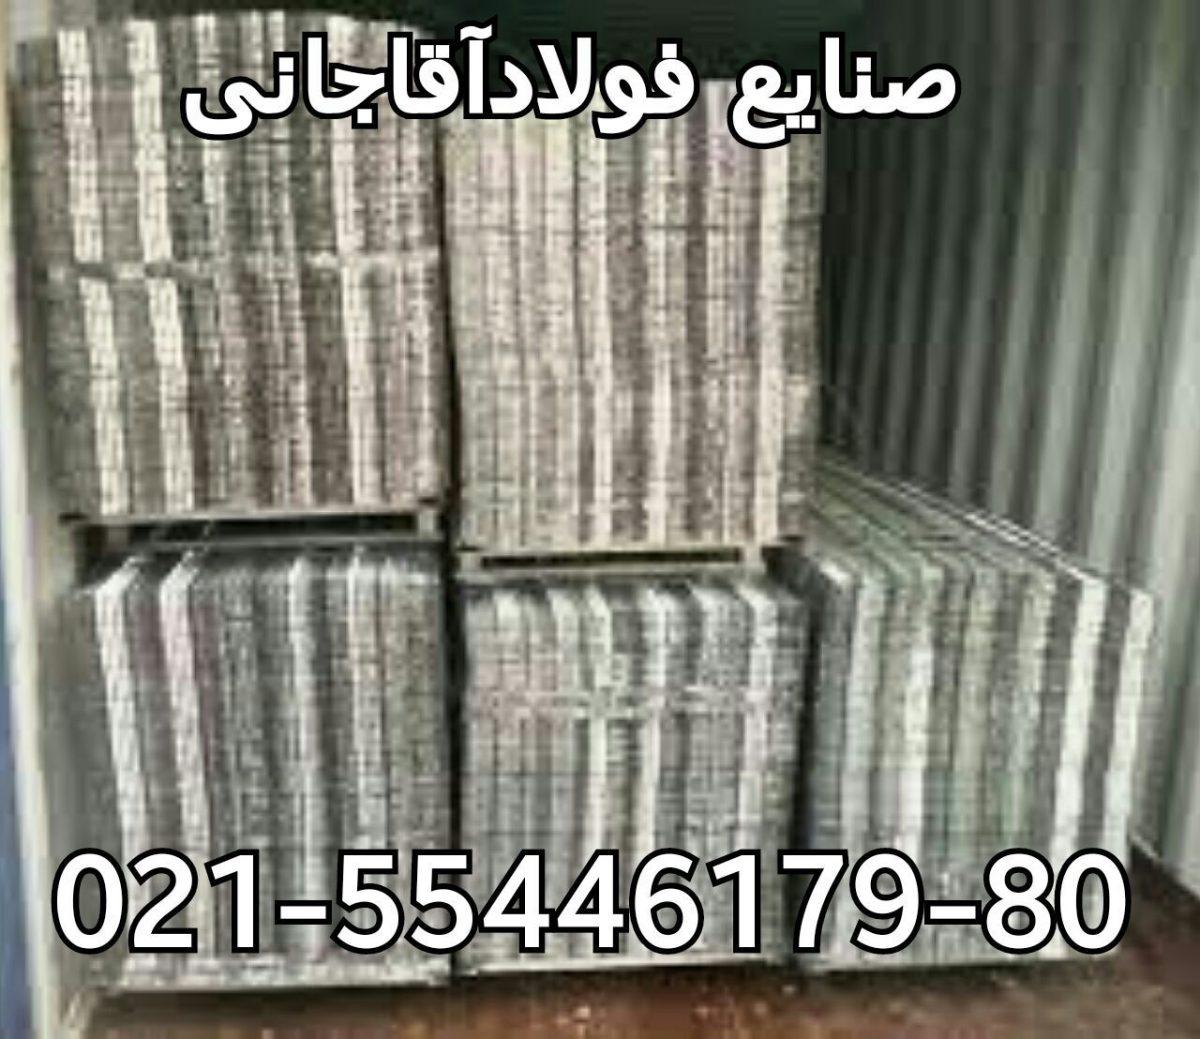 IMG_20190815_100122_583